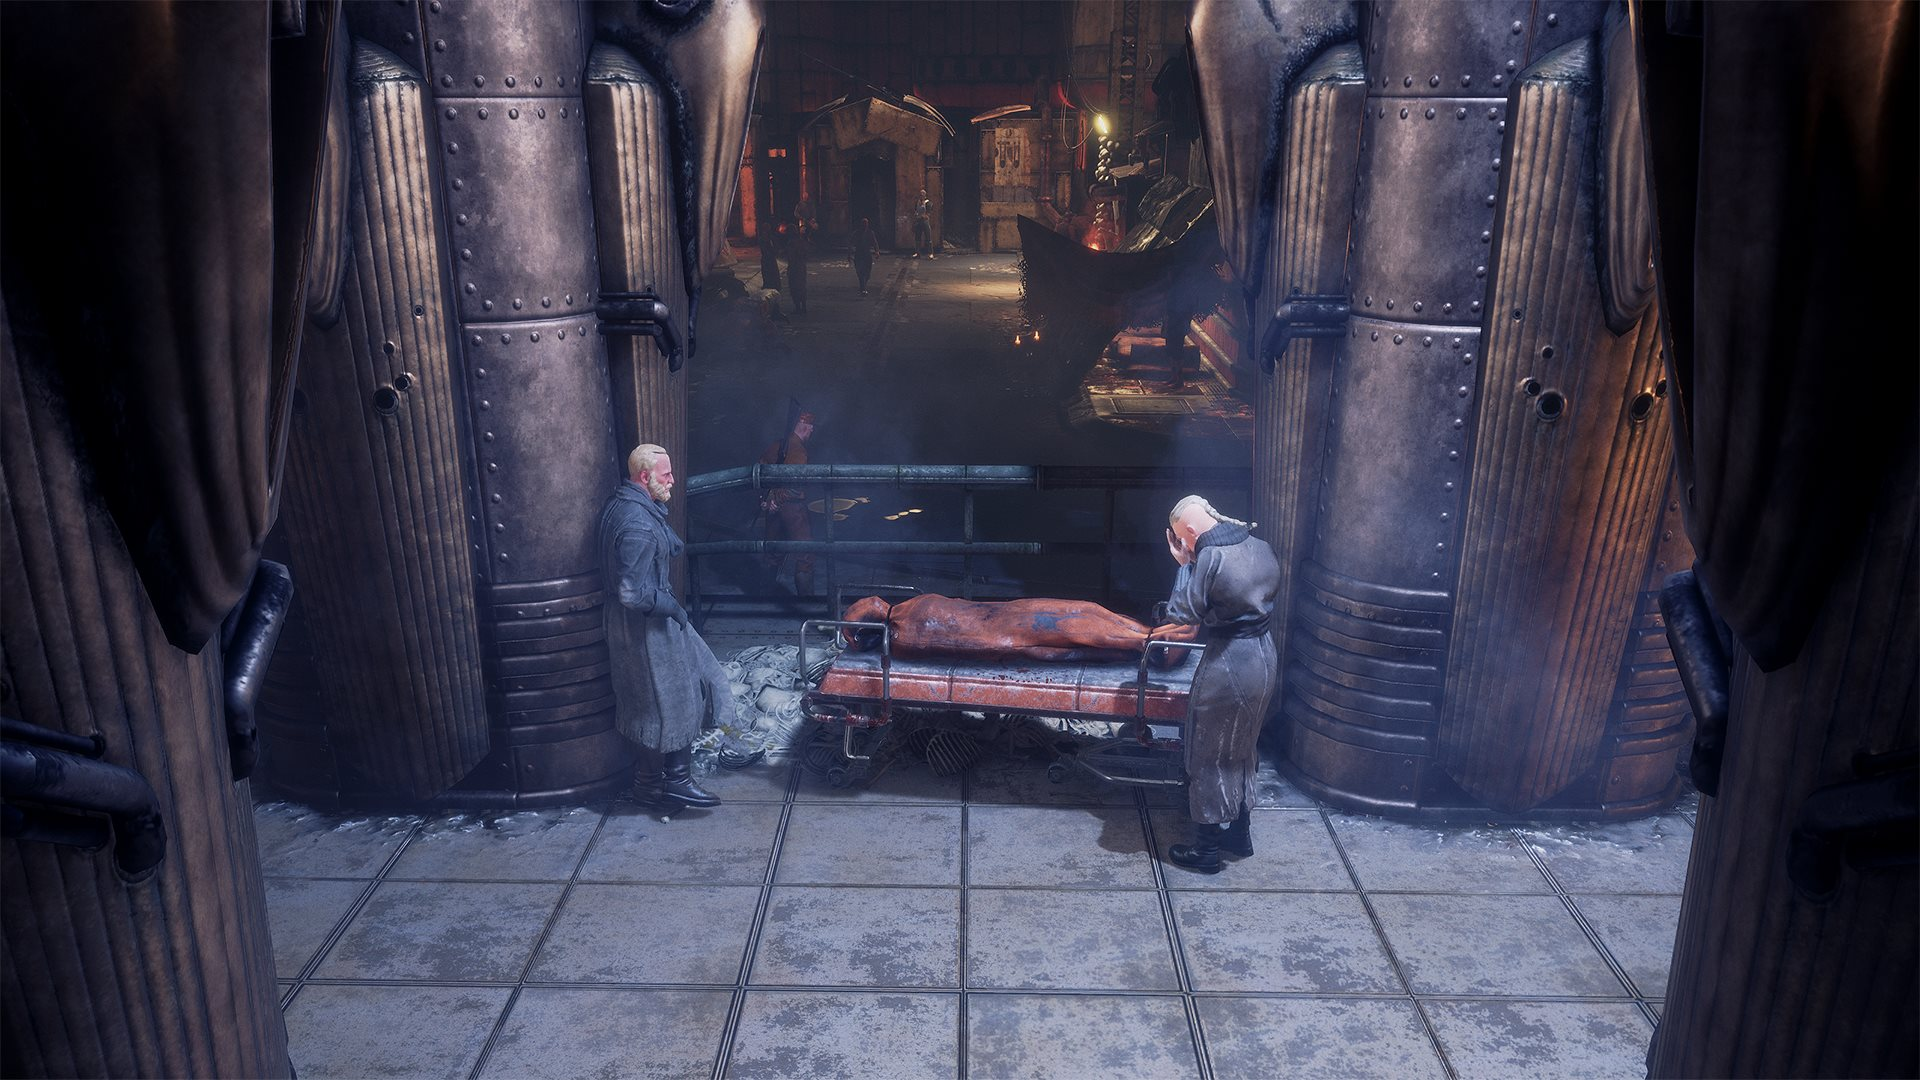 Insomnia: The Ark Screenshot 7 - Bilderquelle: HeroCraft